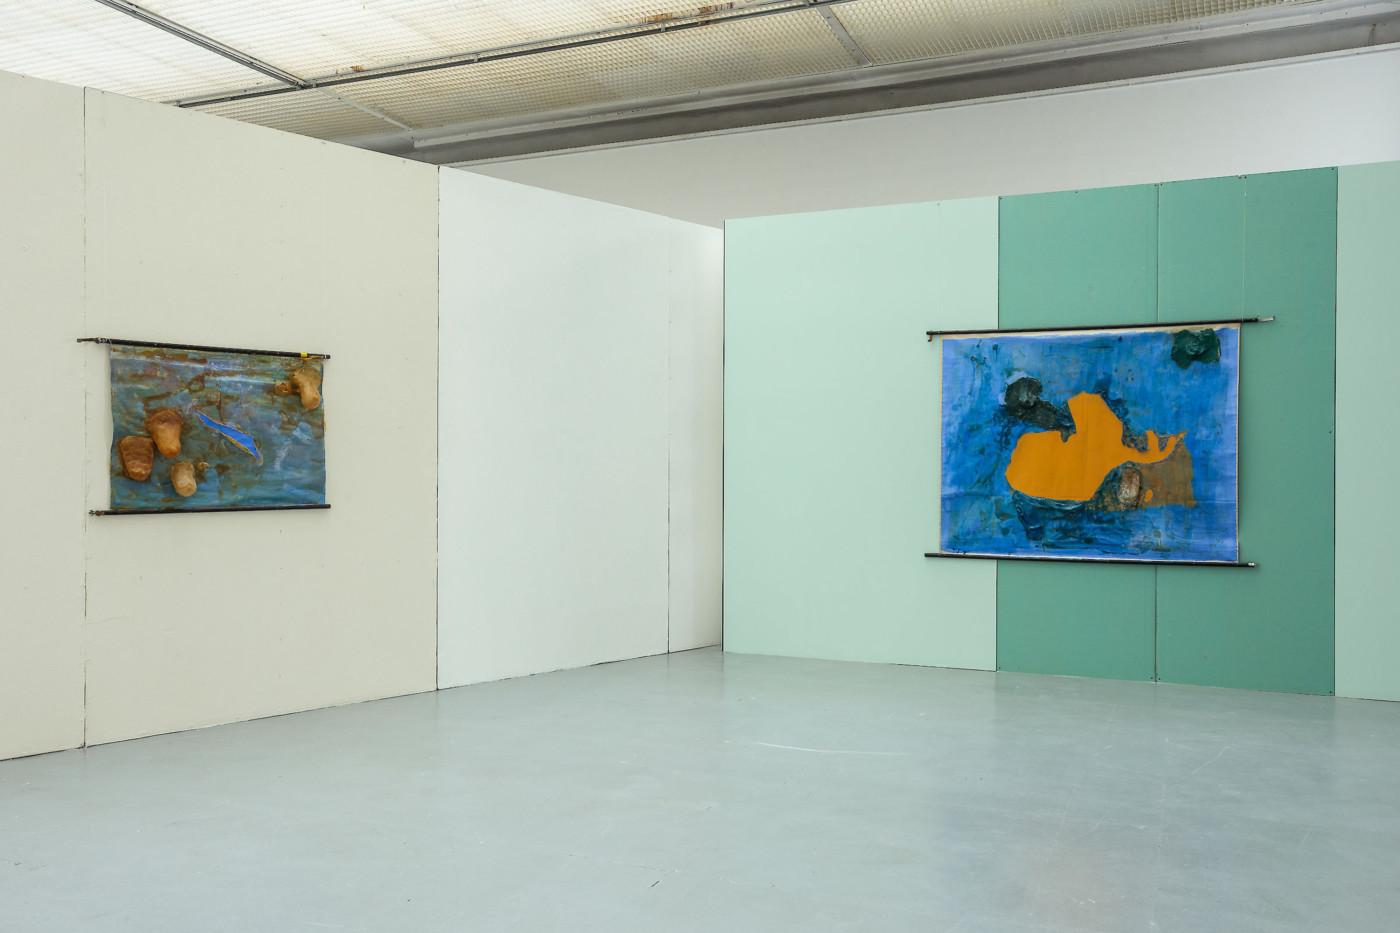 OLGA BALEMA  Give up the Ghost , 2018, Baltic Triennial, BTXIII, CAC, Vilnius, installation view  - High Art Gallery Paris